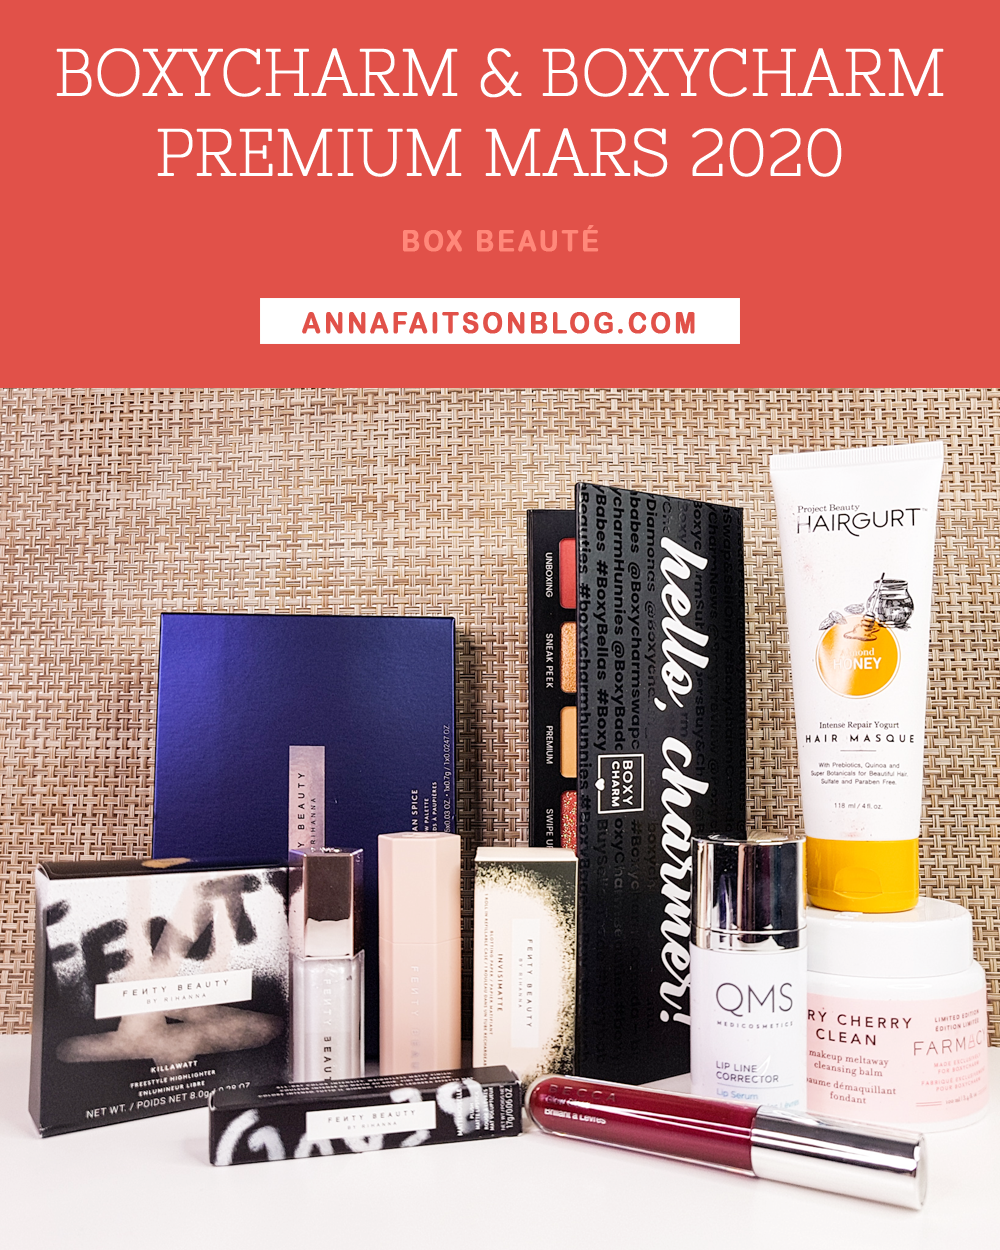 Boxycharm & Boxycharm Premium Mars 2020